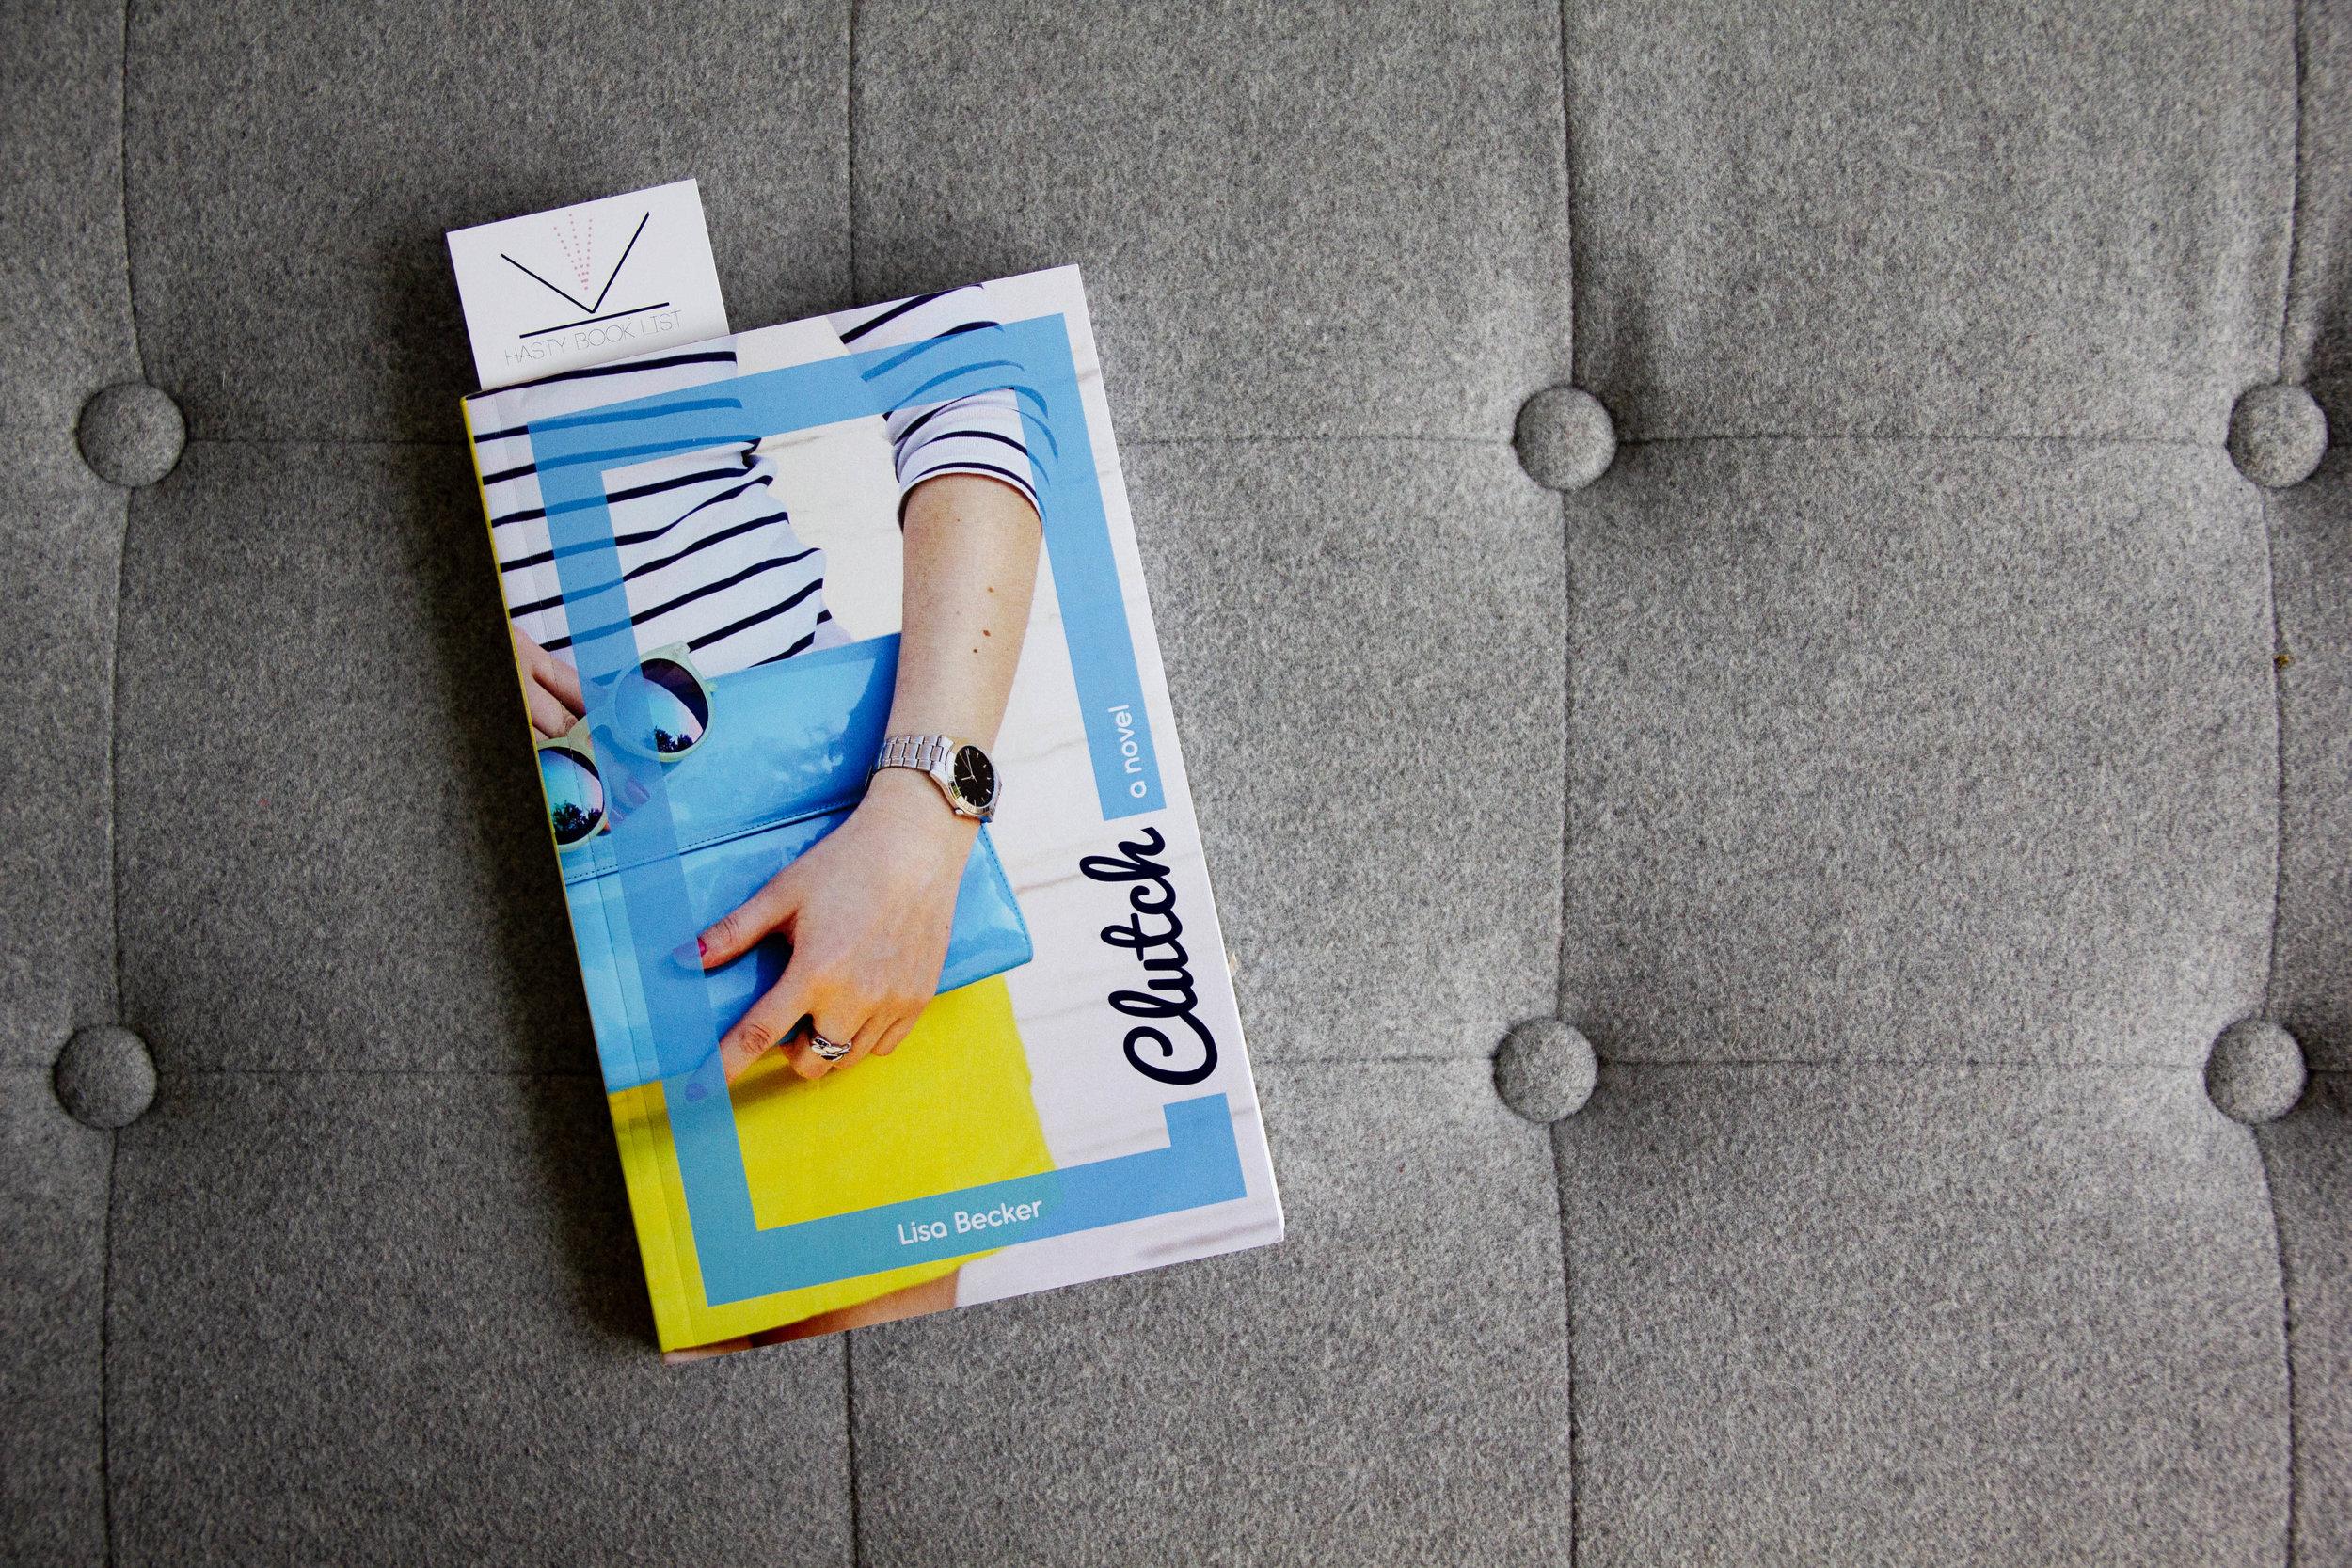 Book Feature of Clutch by Lisa Becker